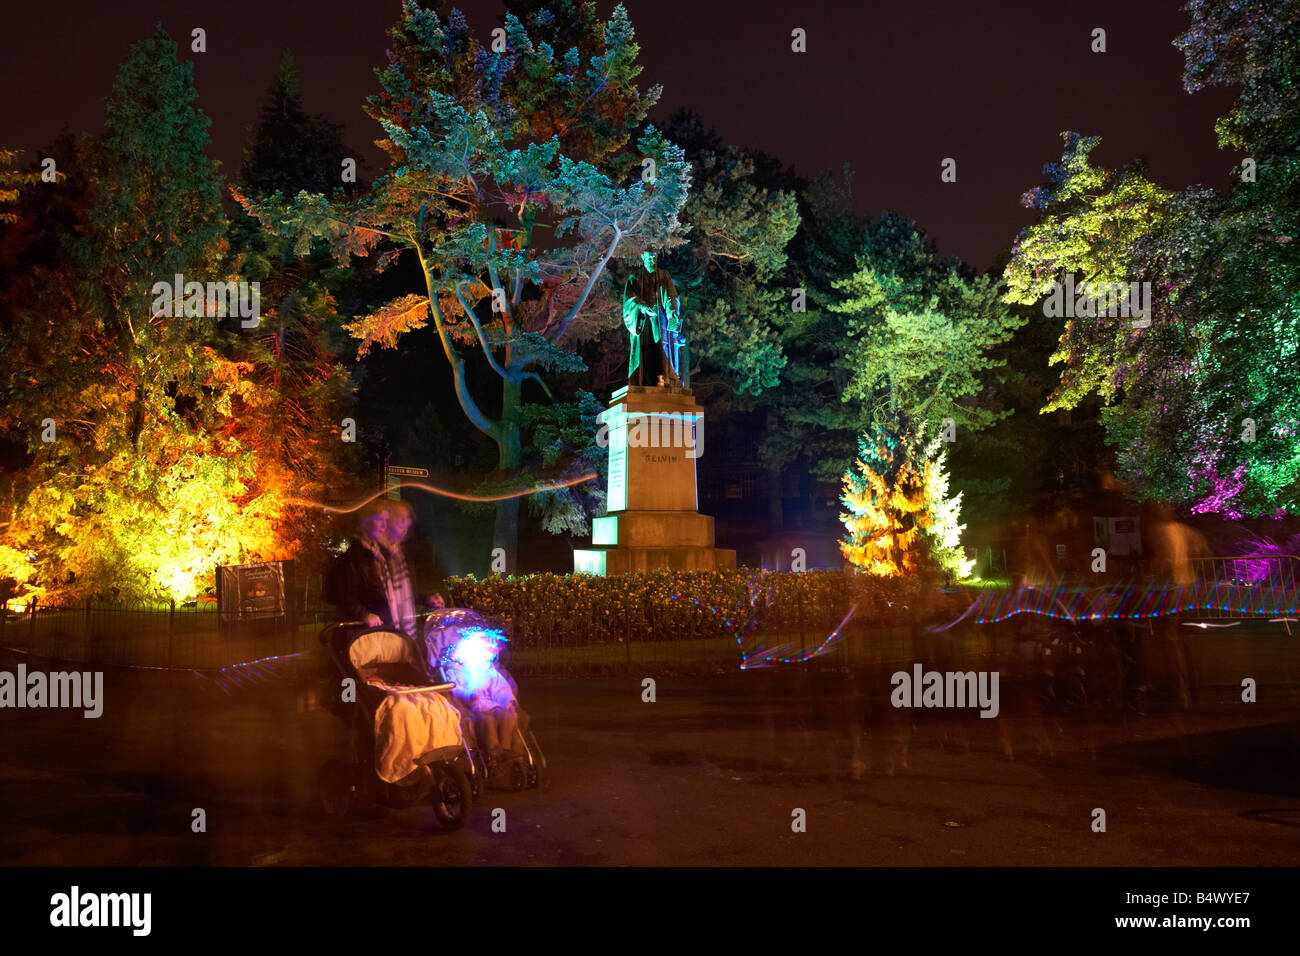 Enchanted evenings event held at Botanic Gardens in Belfast northern ireland - Stock Image